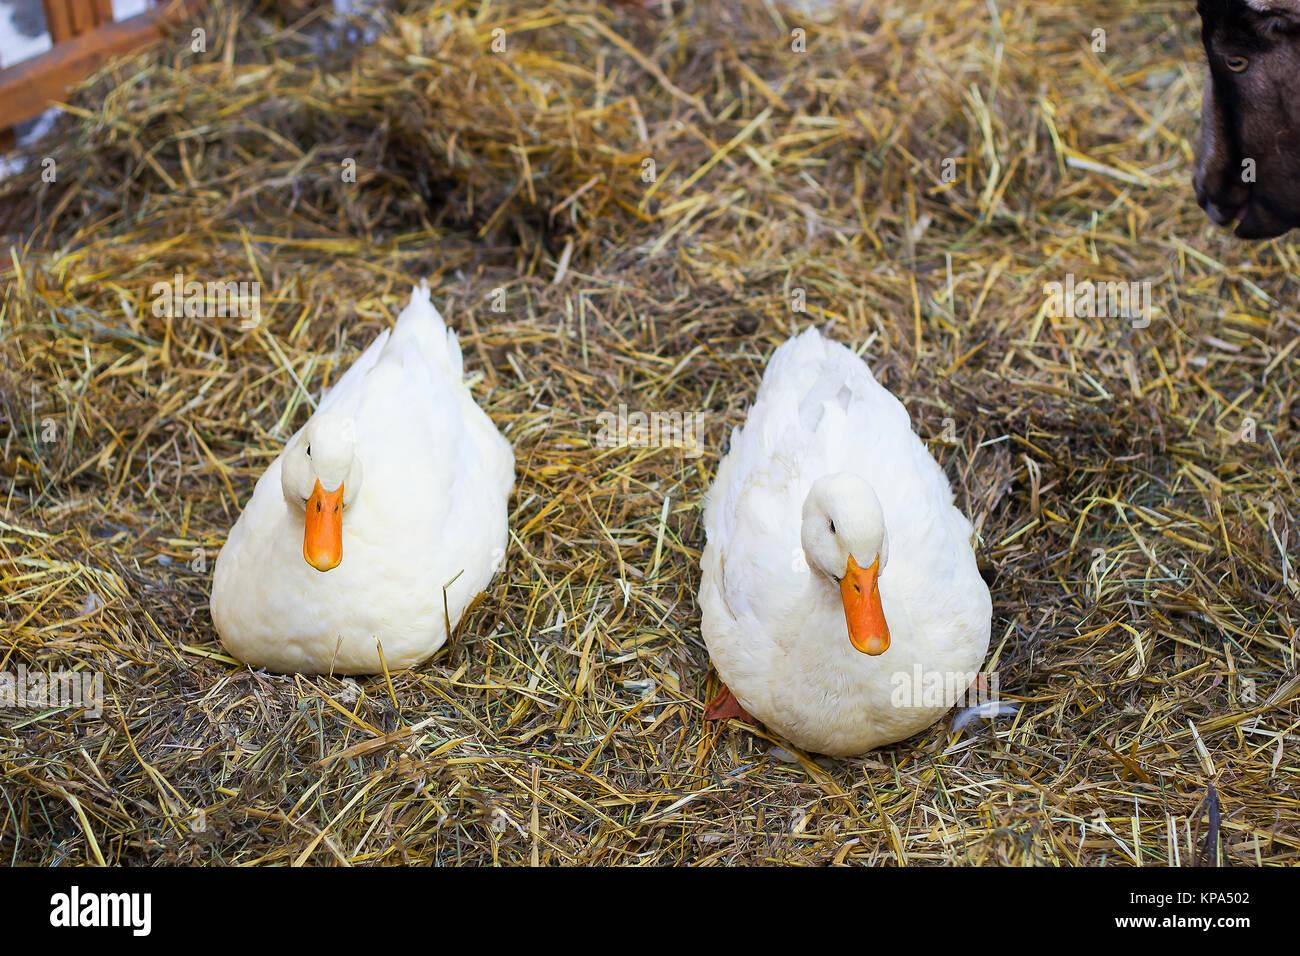 Pair of white ducks sitting on hay. Pair of Pekin duck - Stock Image